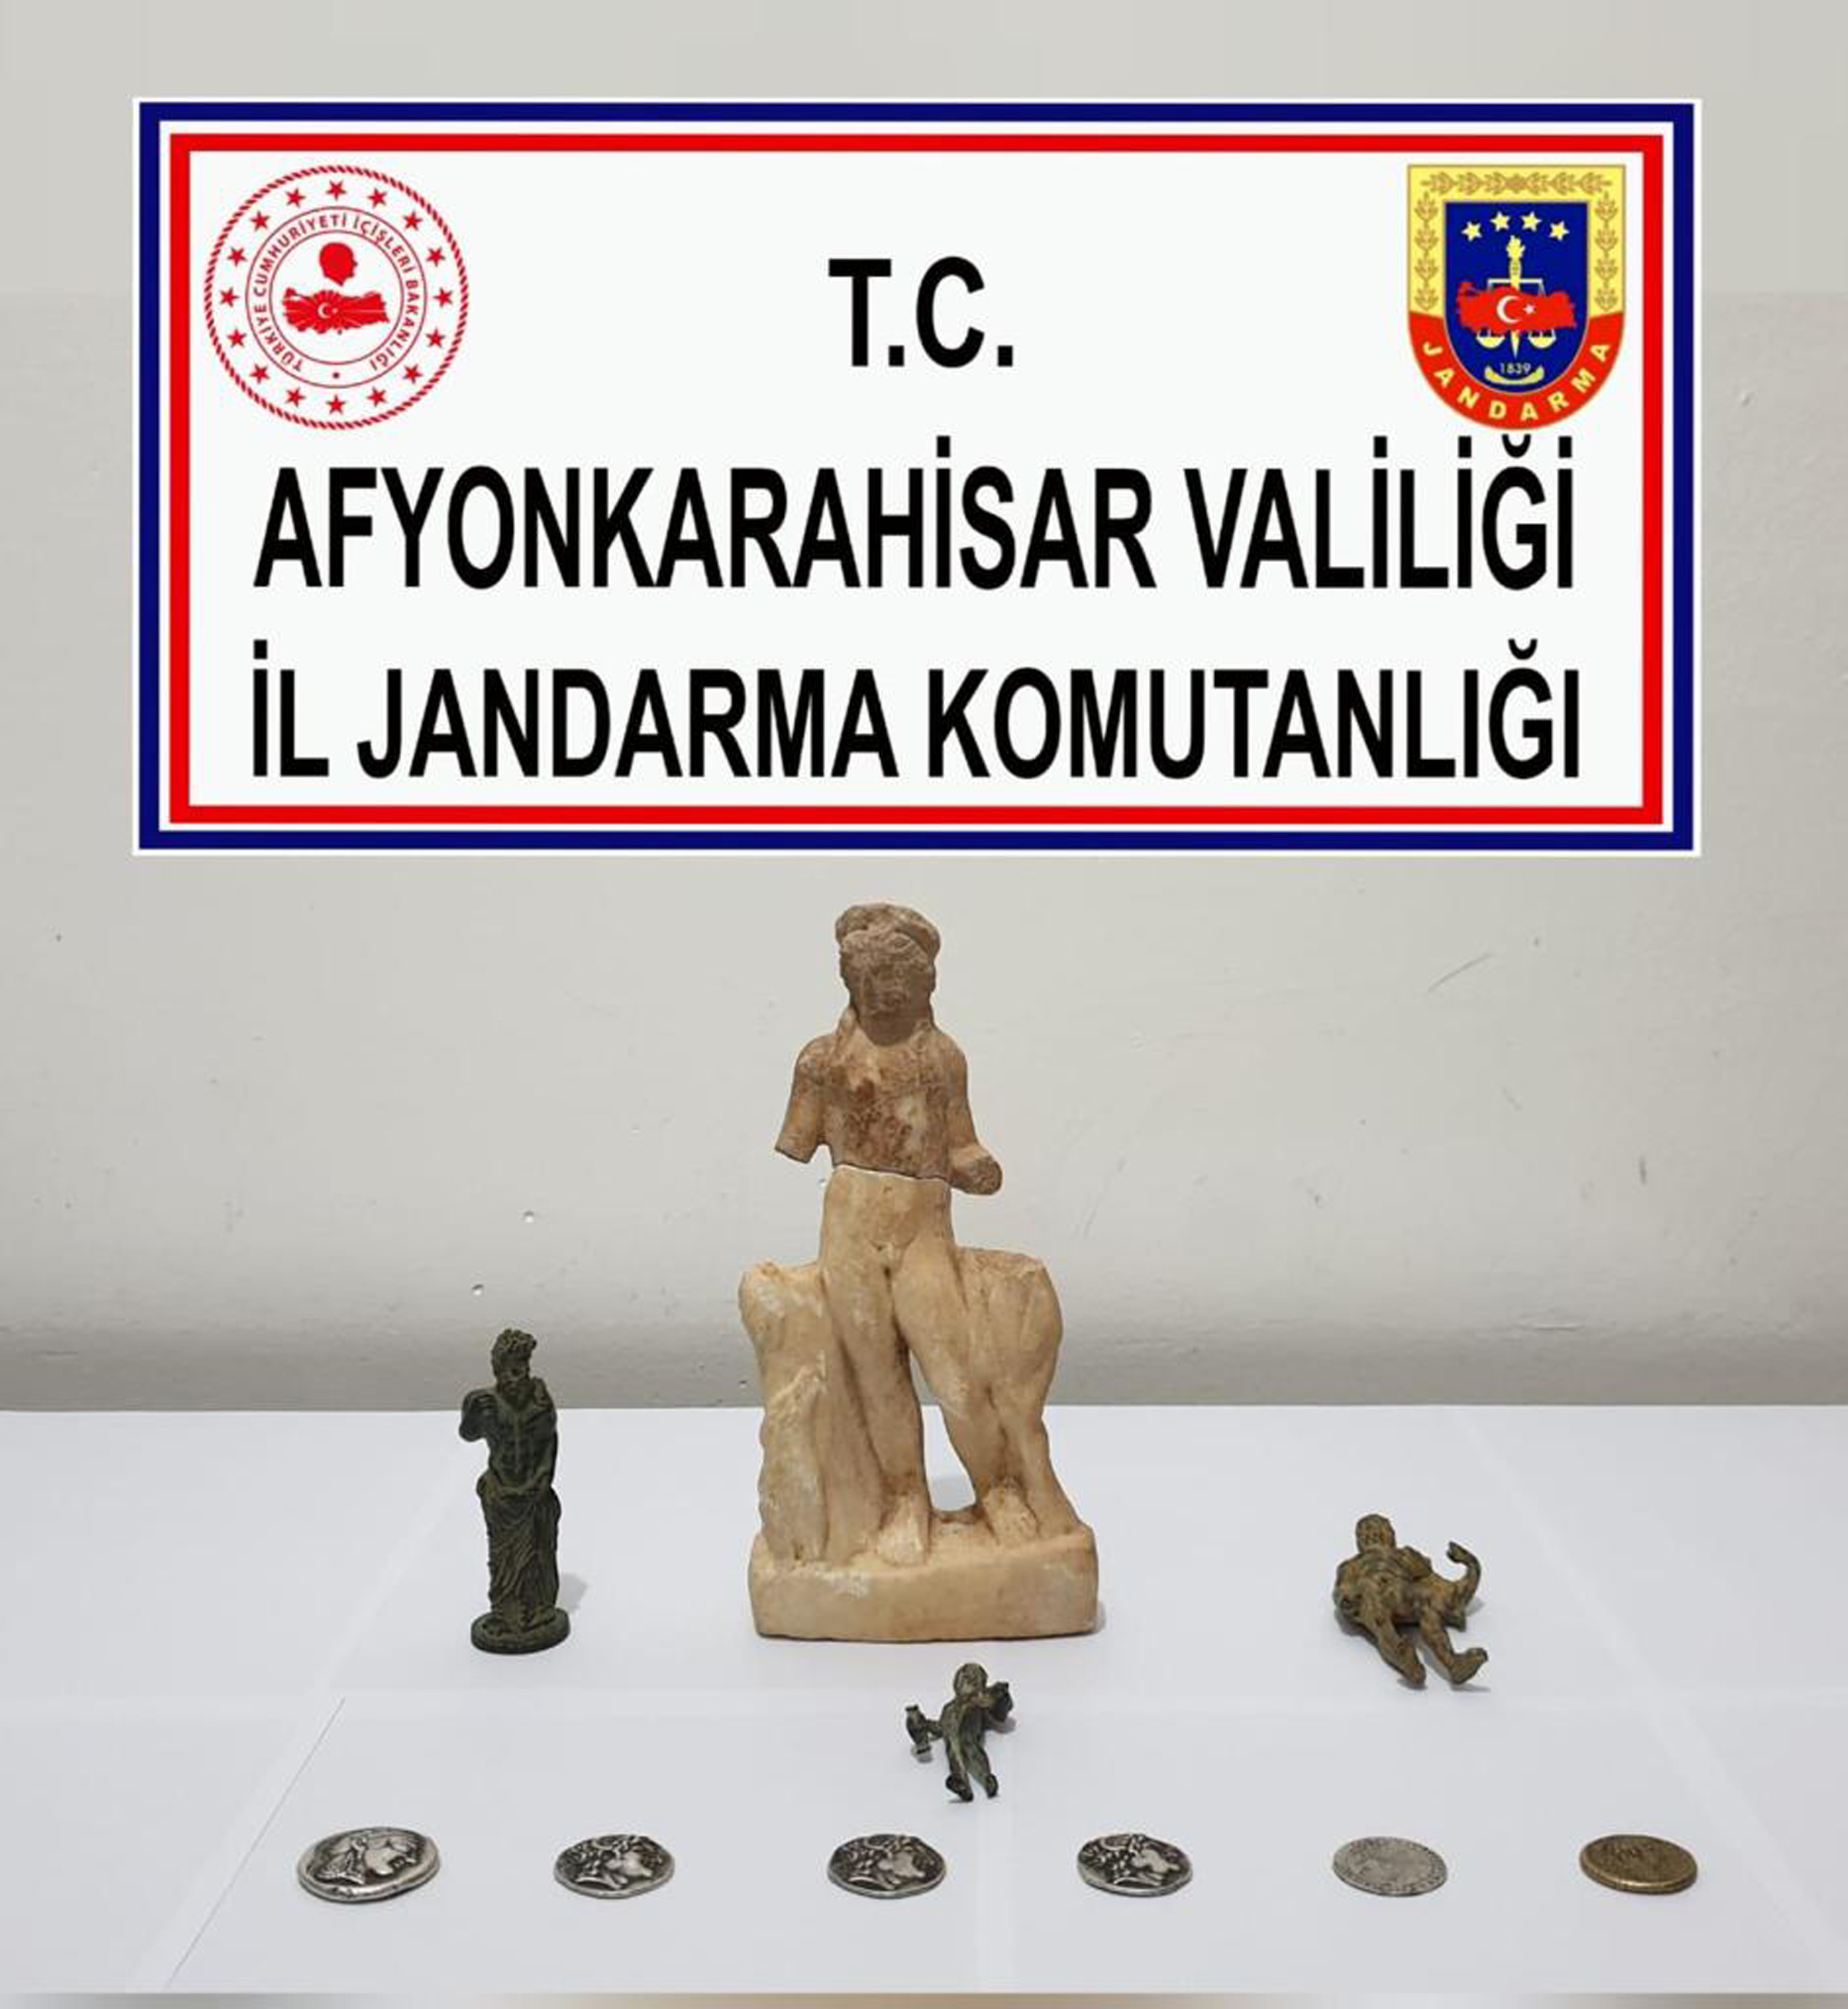 Afyonkarahisar'da tarihi eser operasyonu